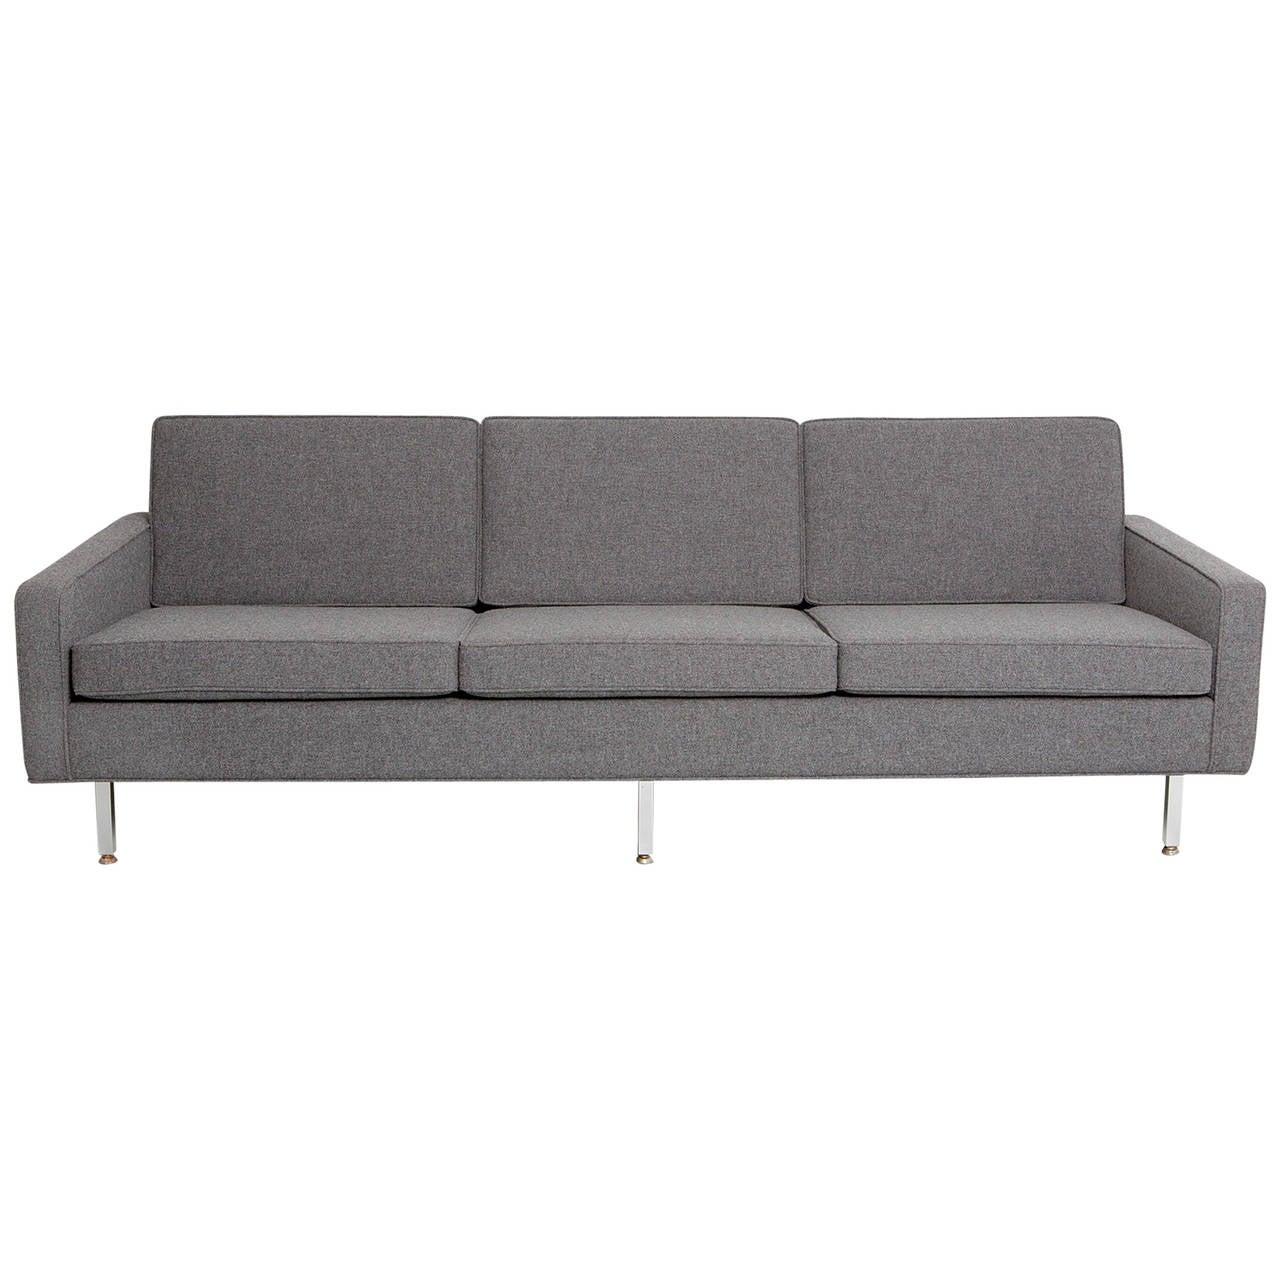 Thonet Sofa For Sale